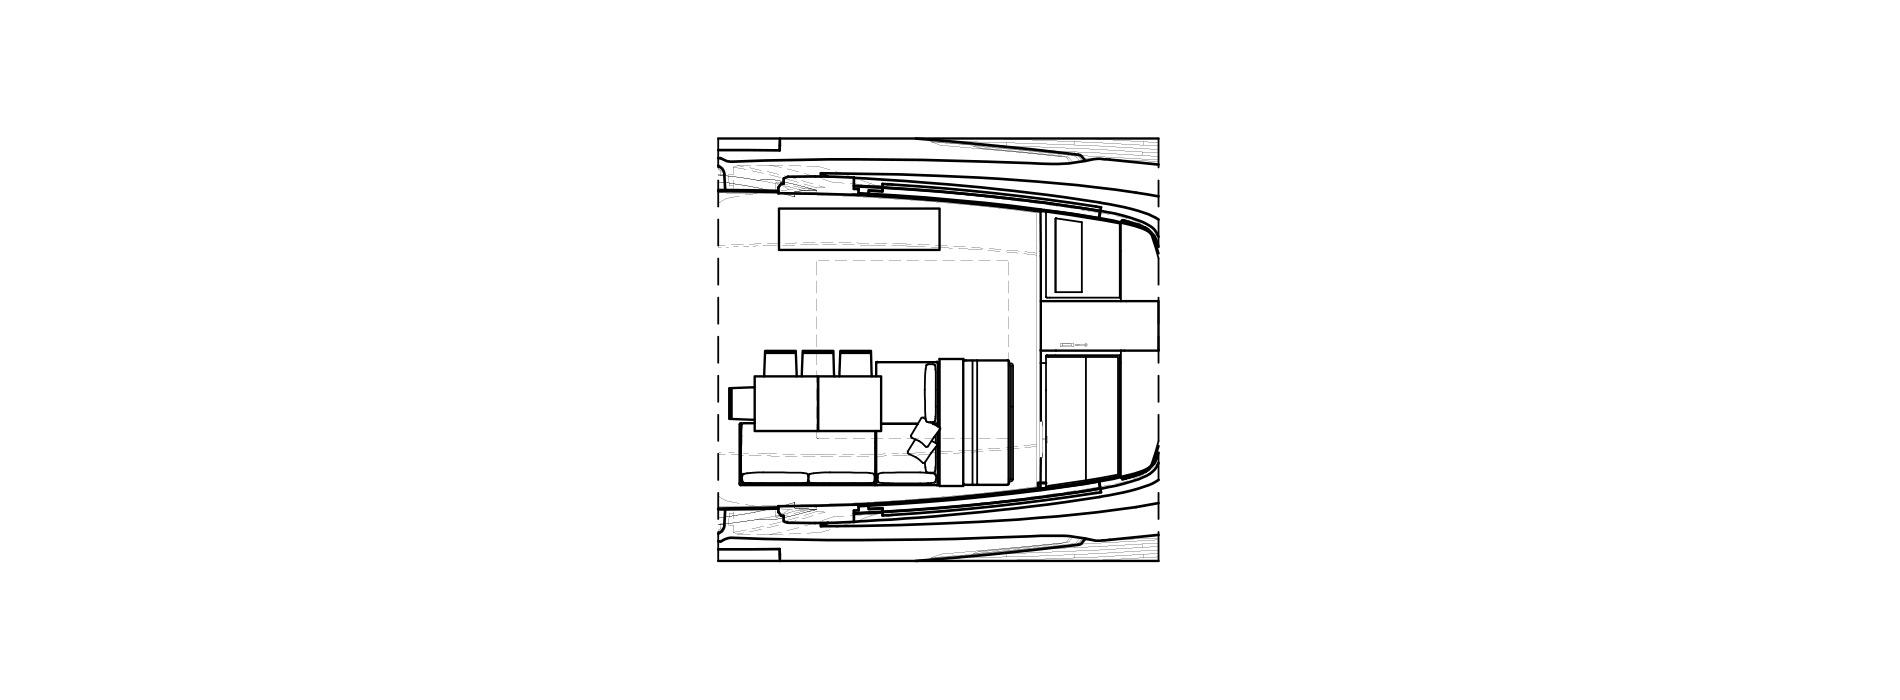 Sanlorenzo Yachts SX88 Details Version B